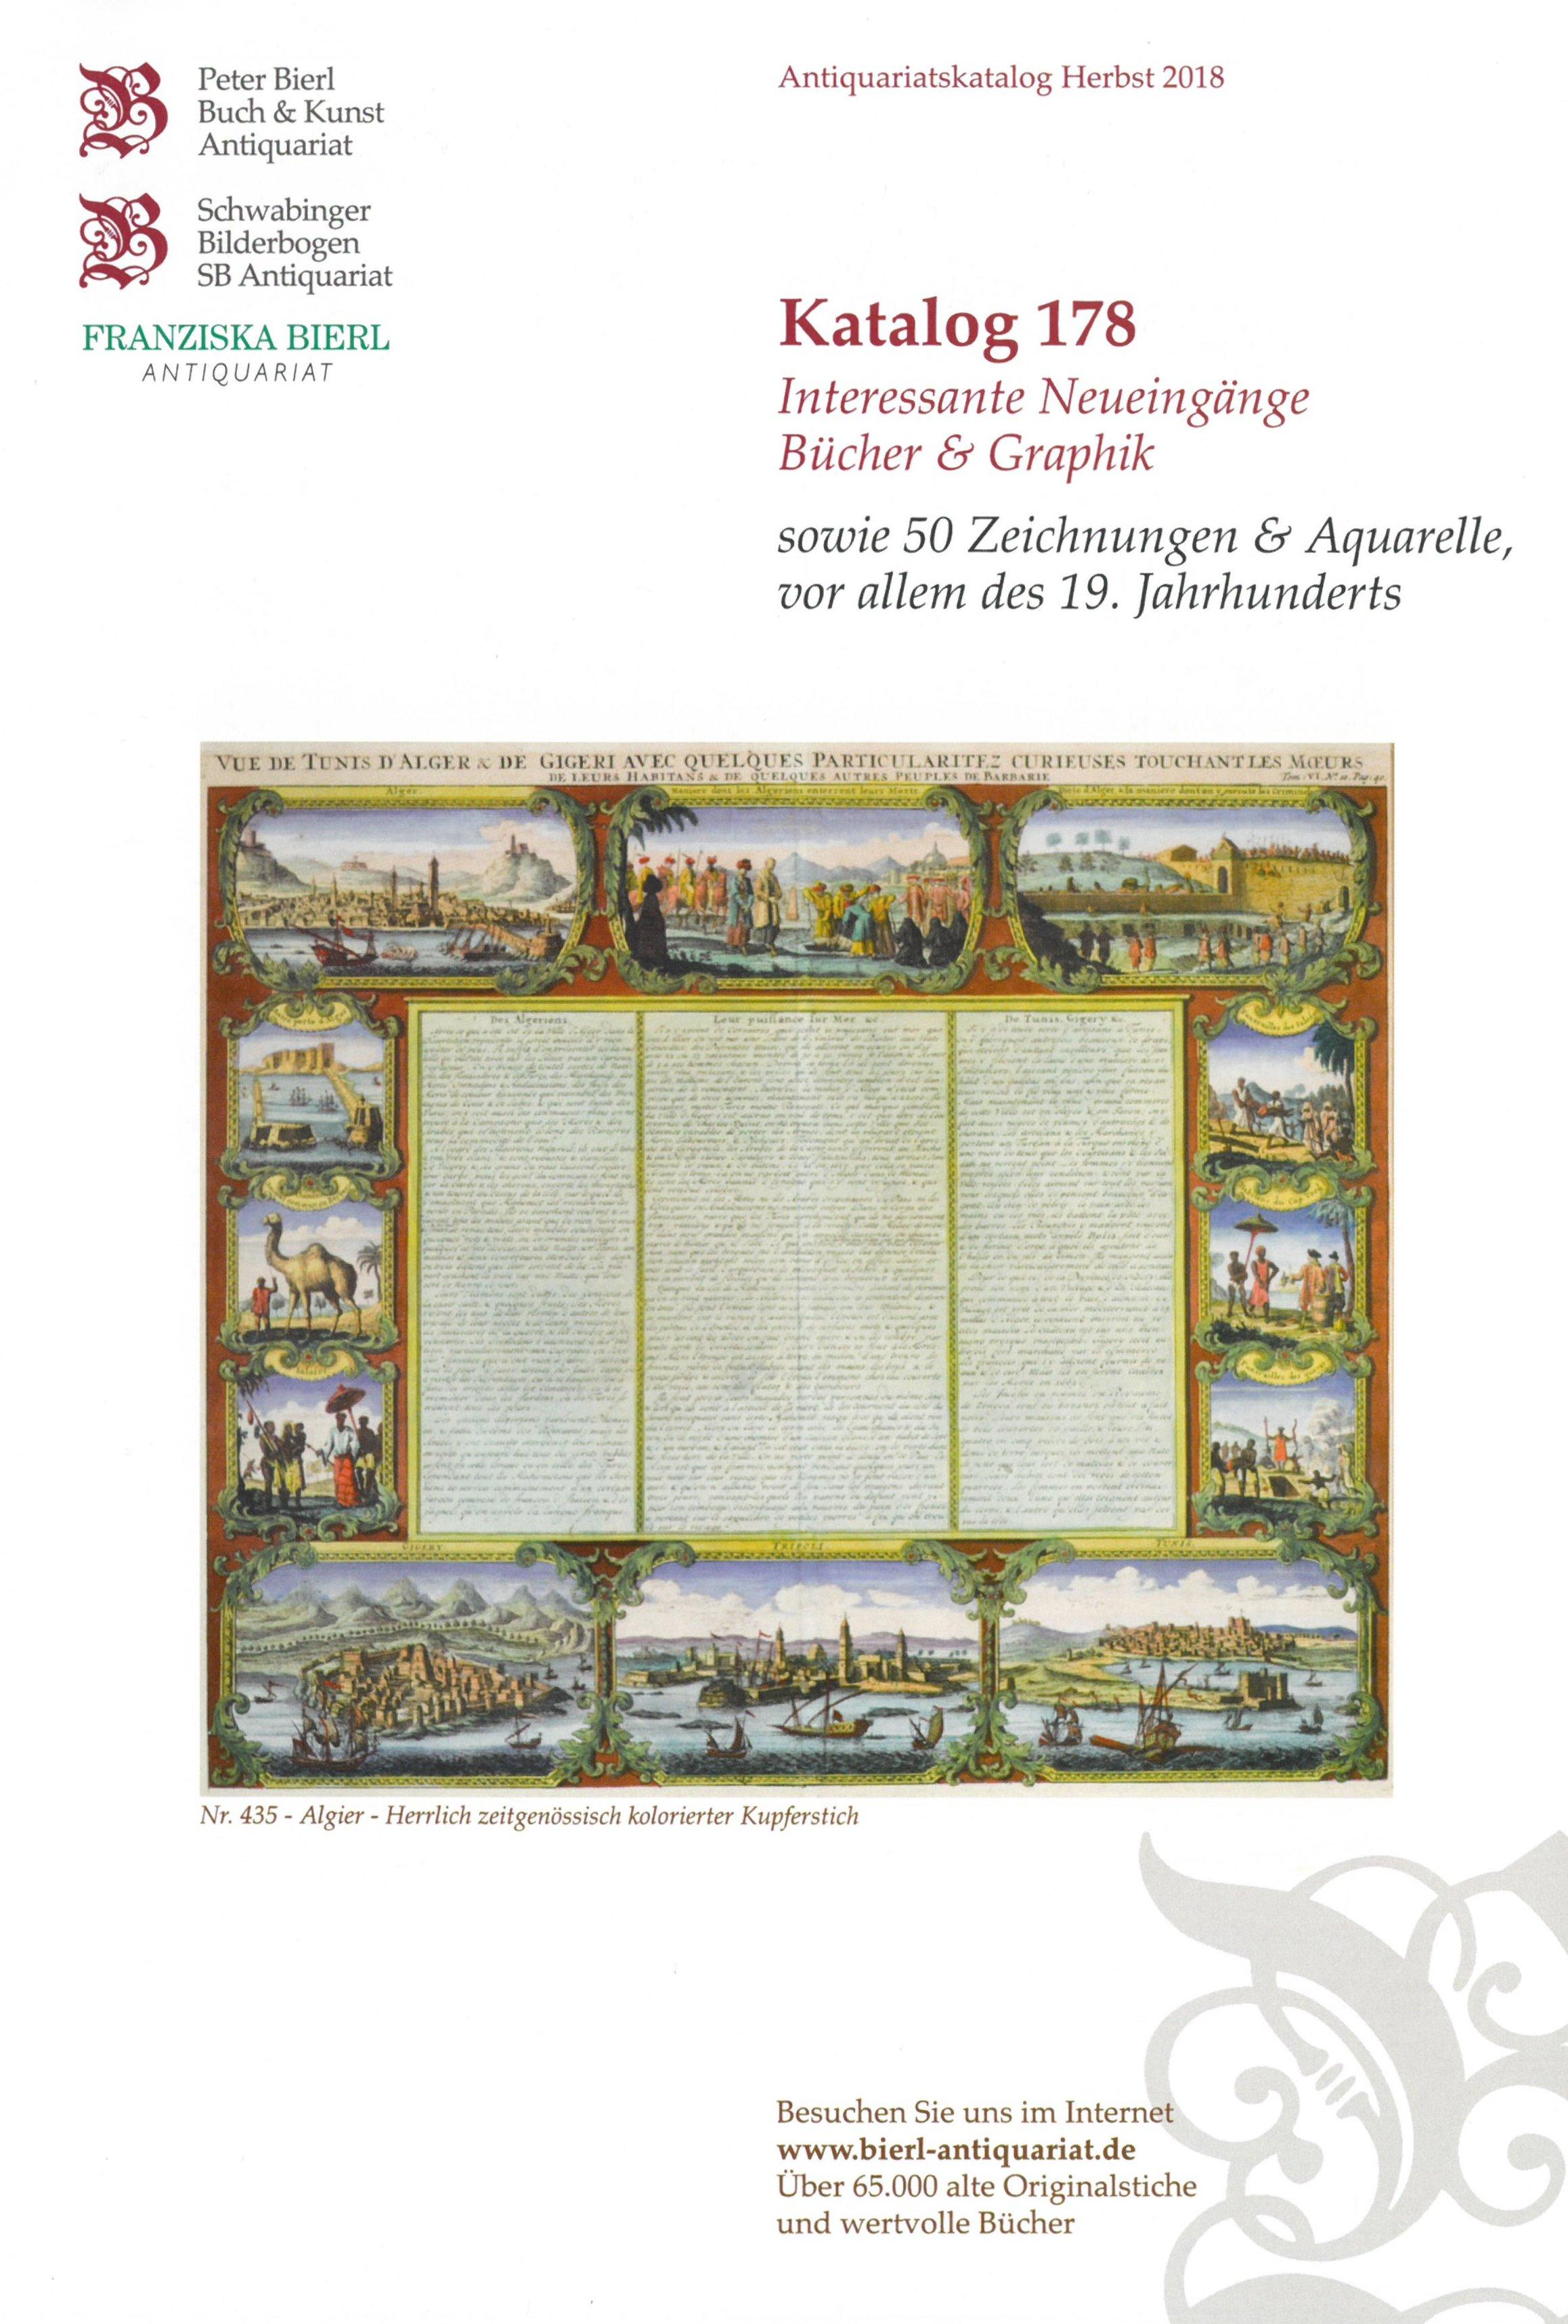 Katalog 178 - Interessante Neueingänge